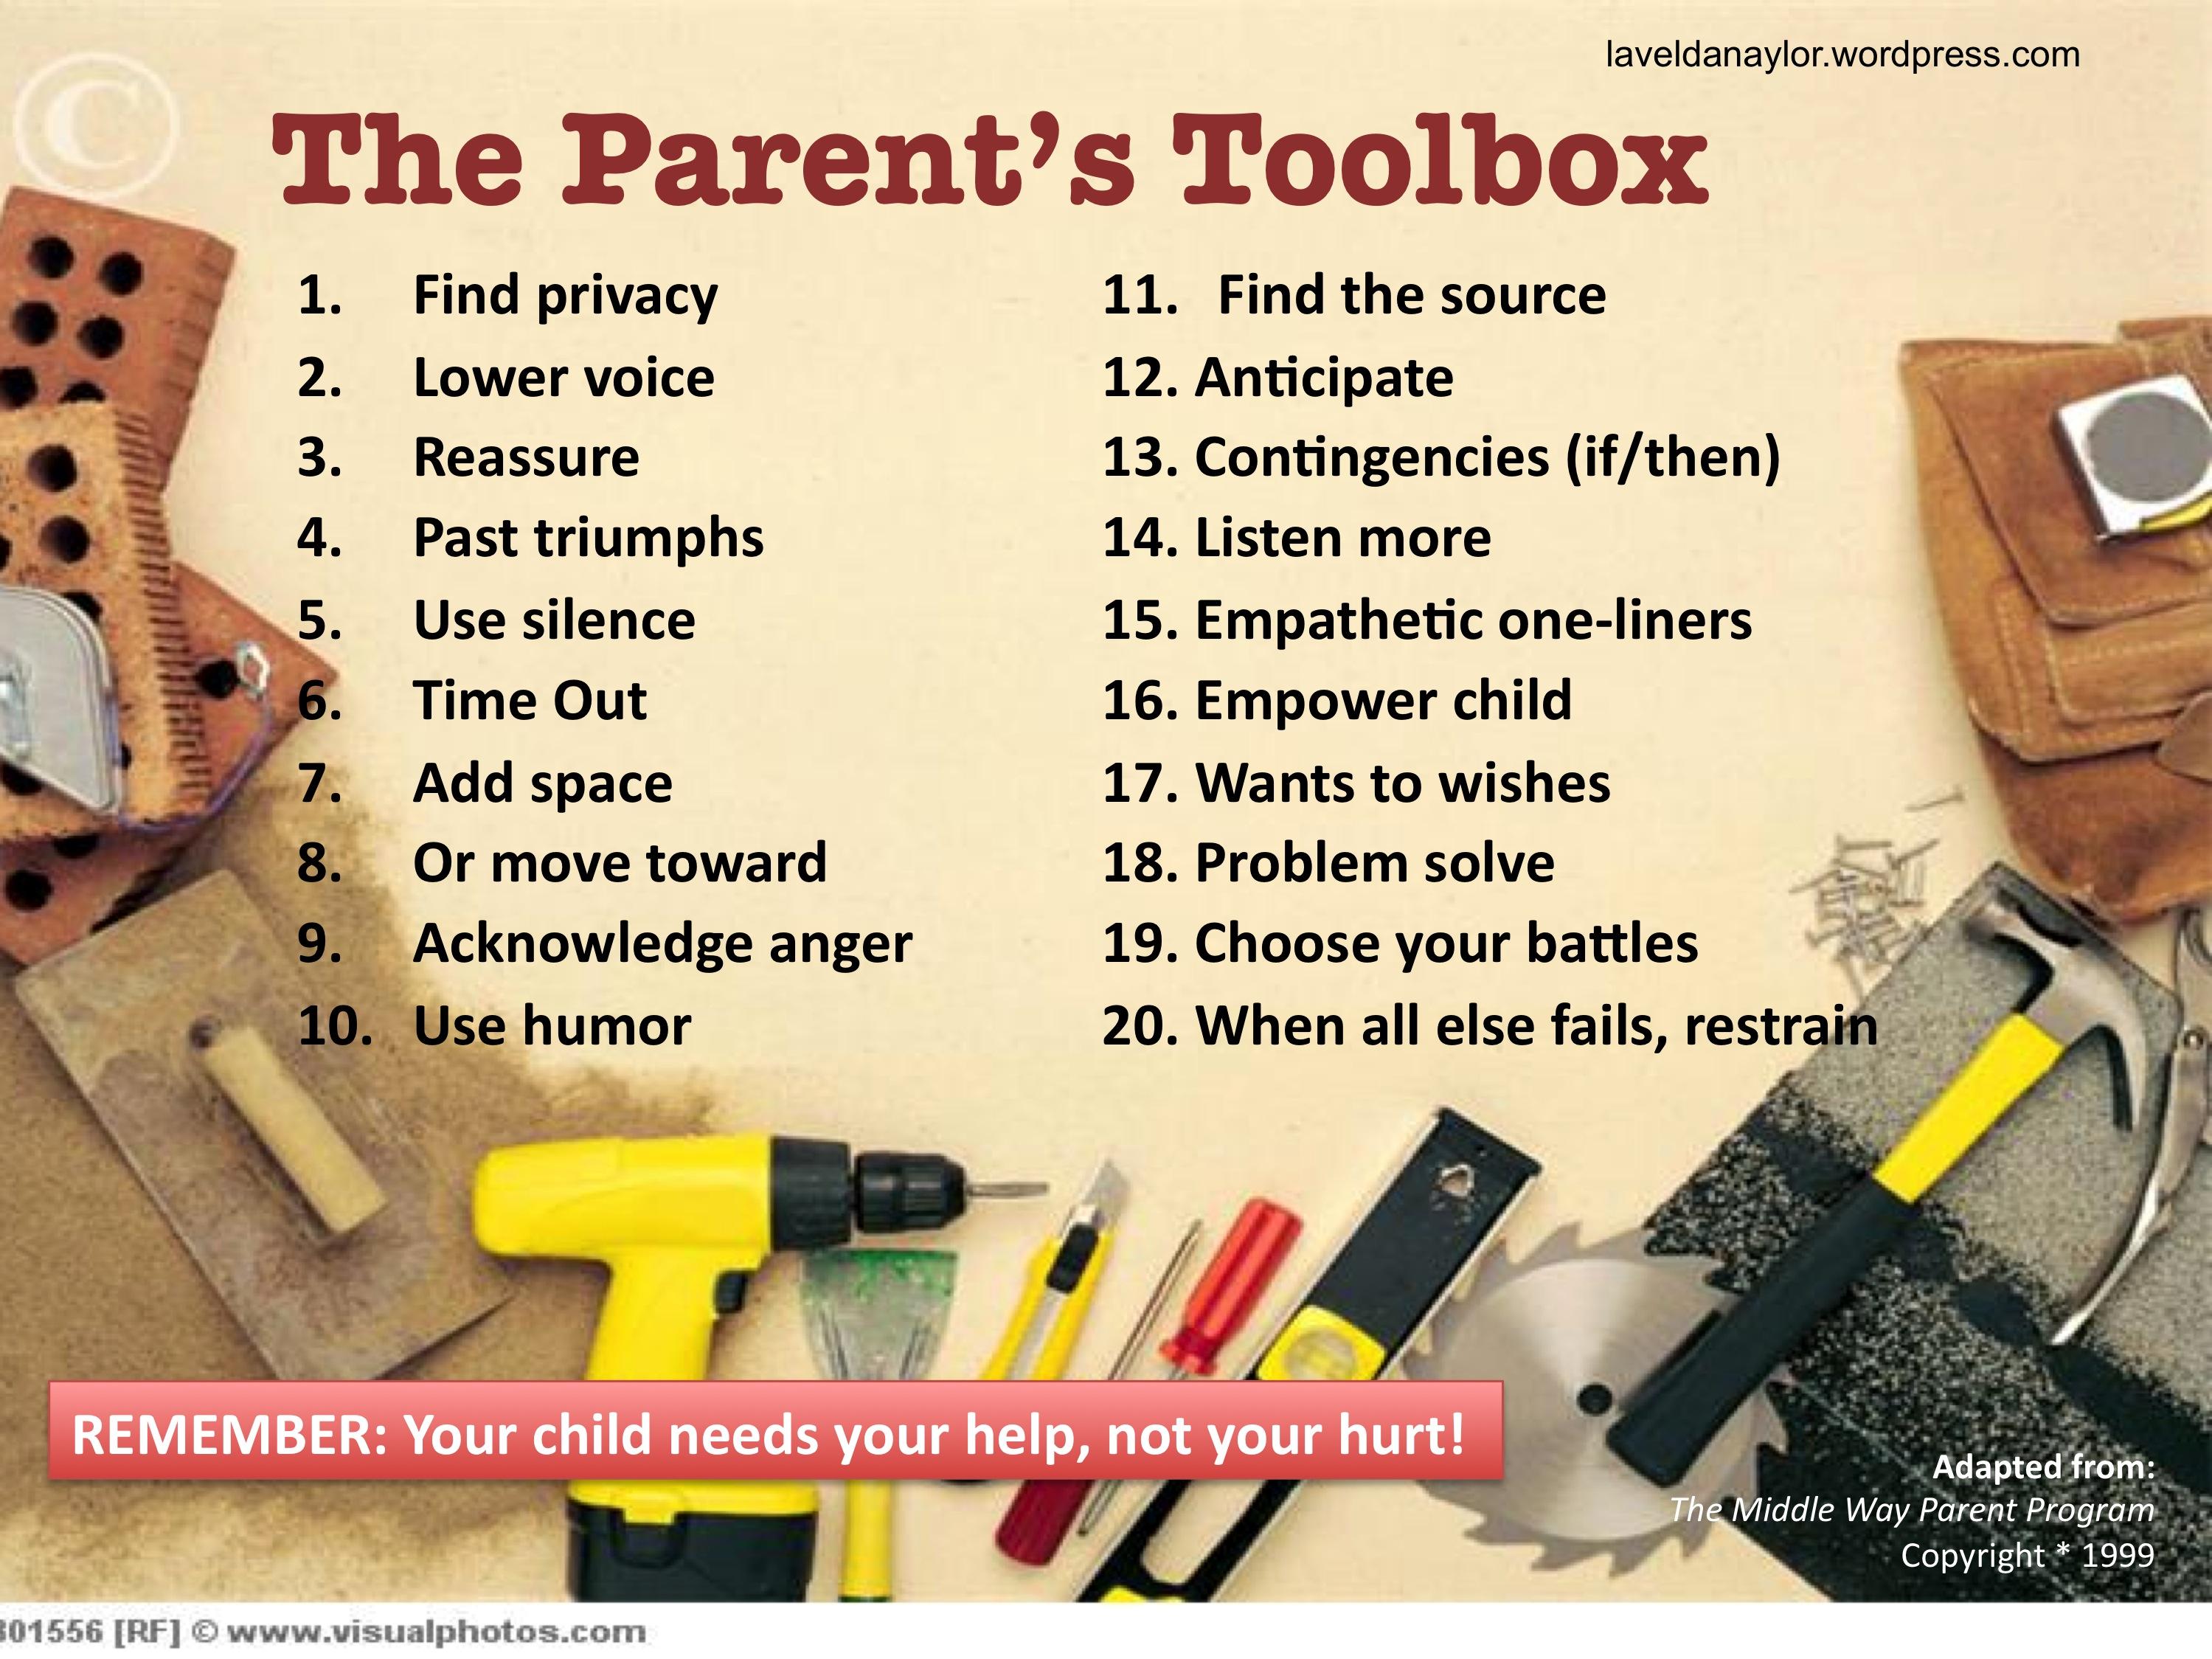 A Parenting Toolbox